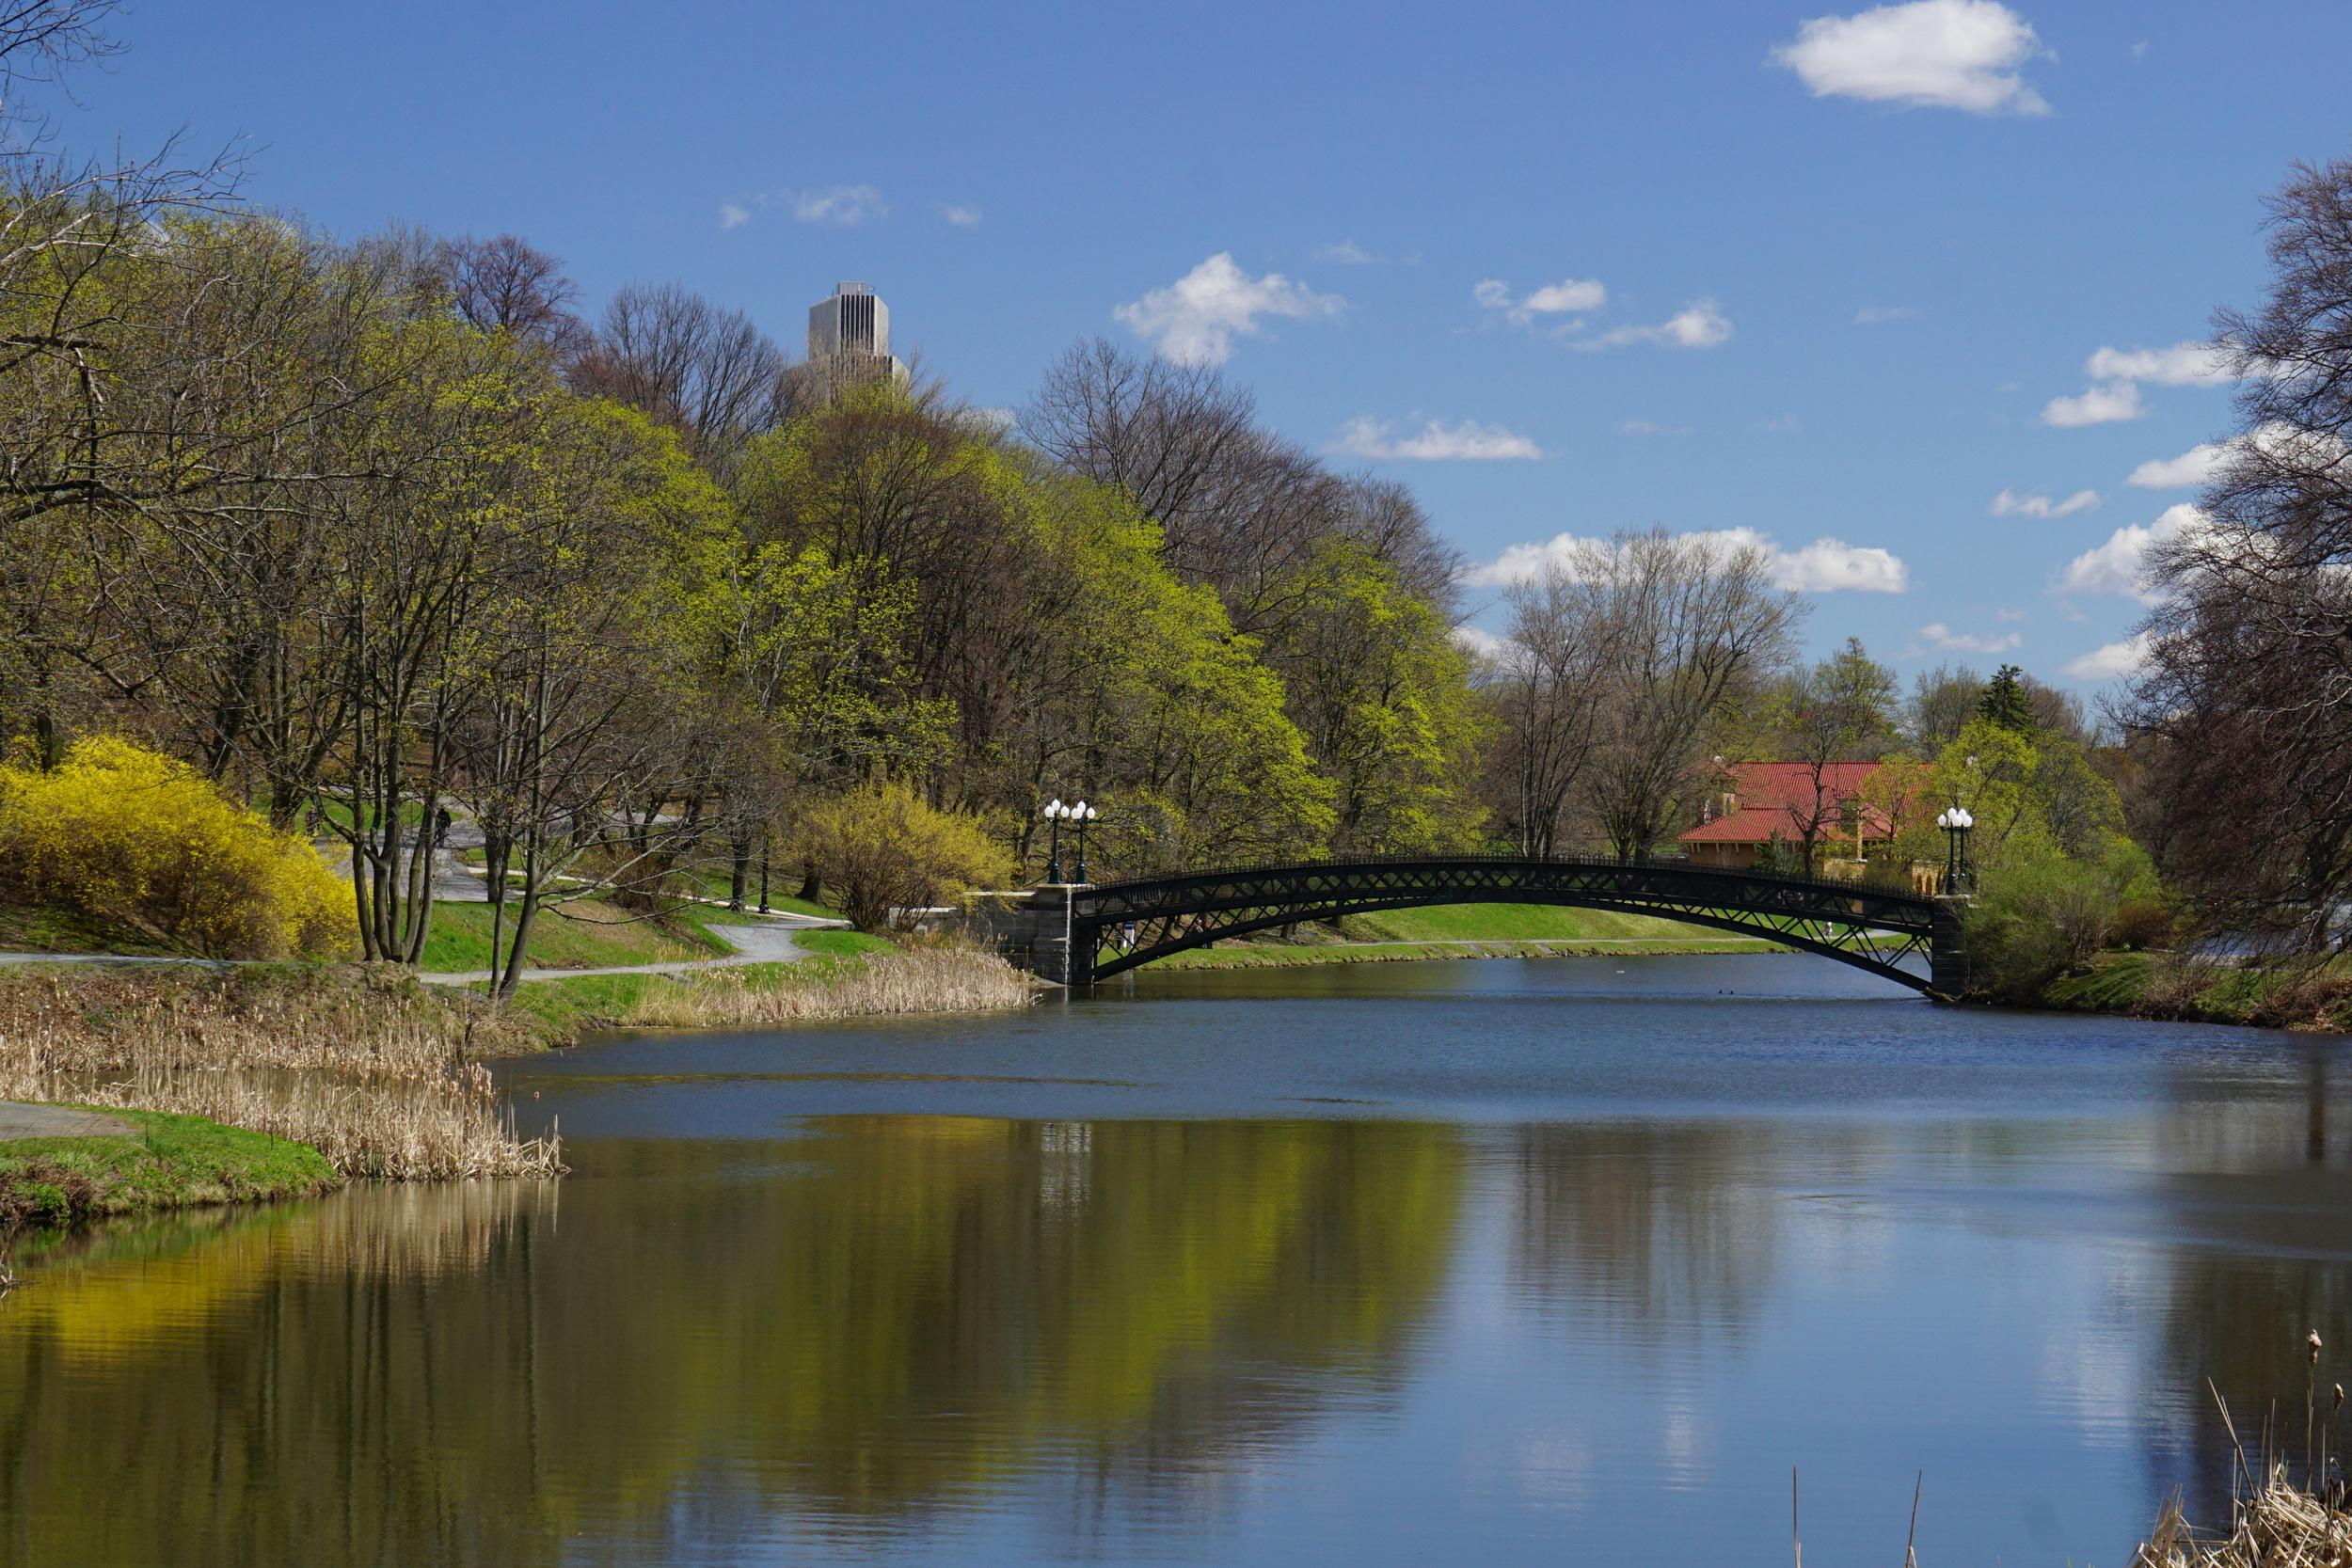 Albany Washington Park Bridge in Spring